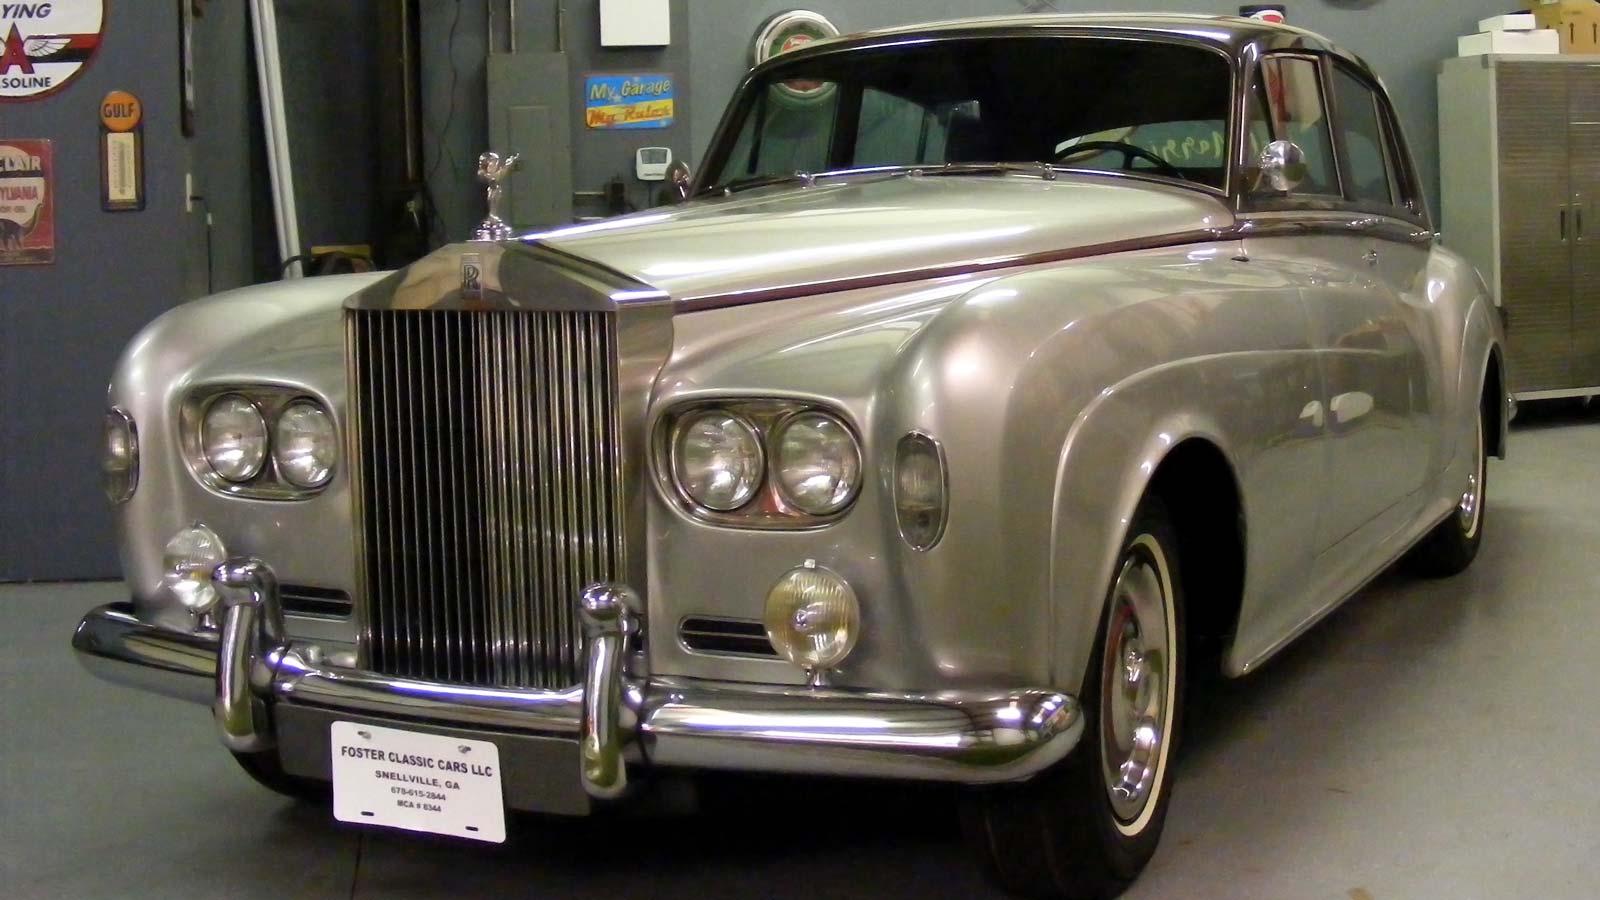 1965 Rolls Royce Silver Cloud III – Foster Classic Cars